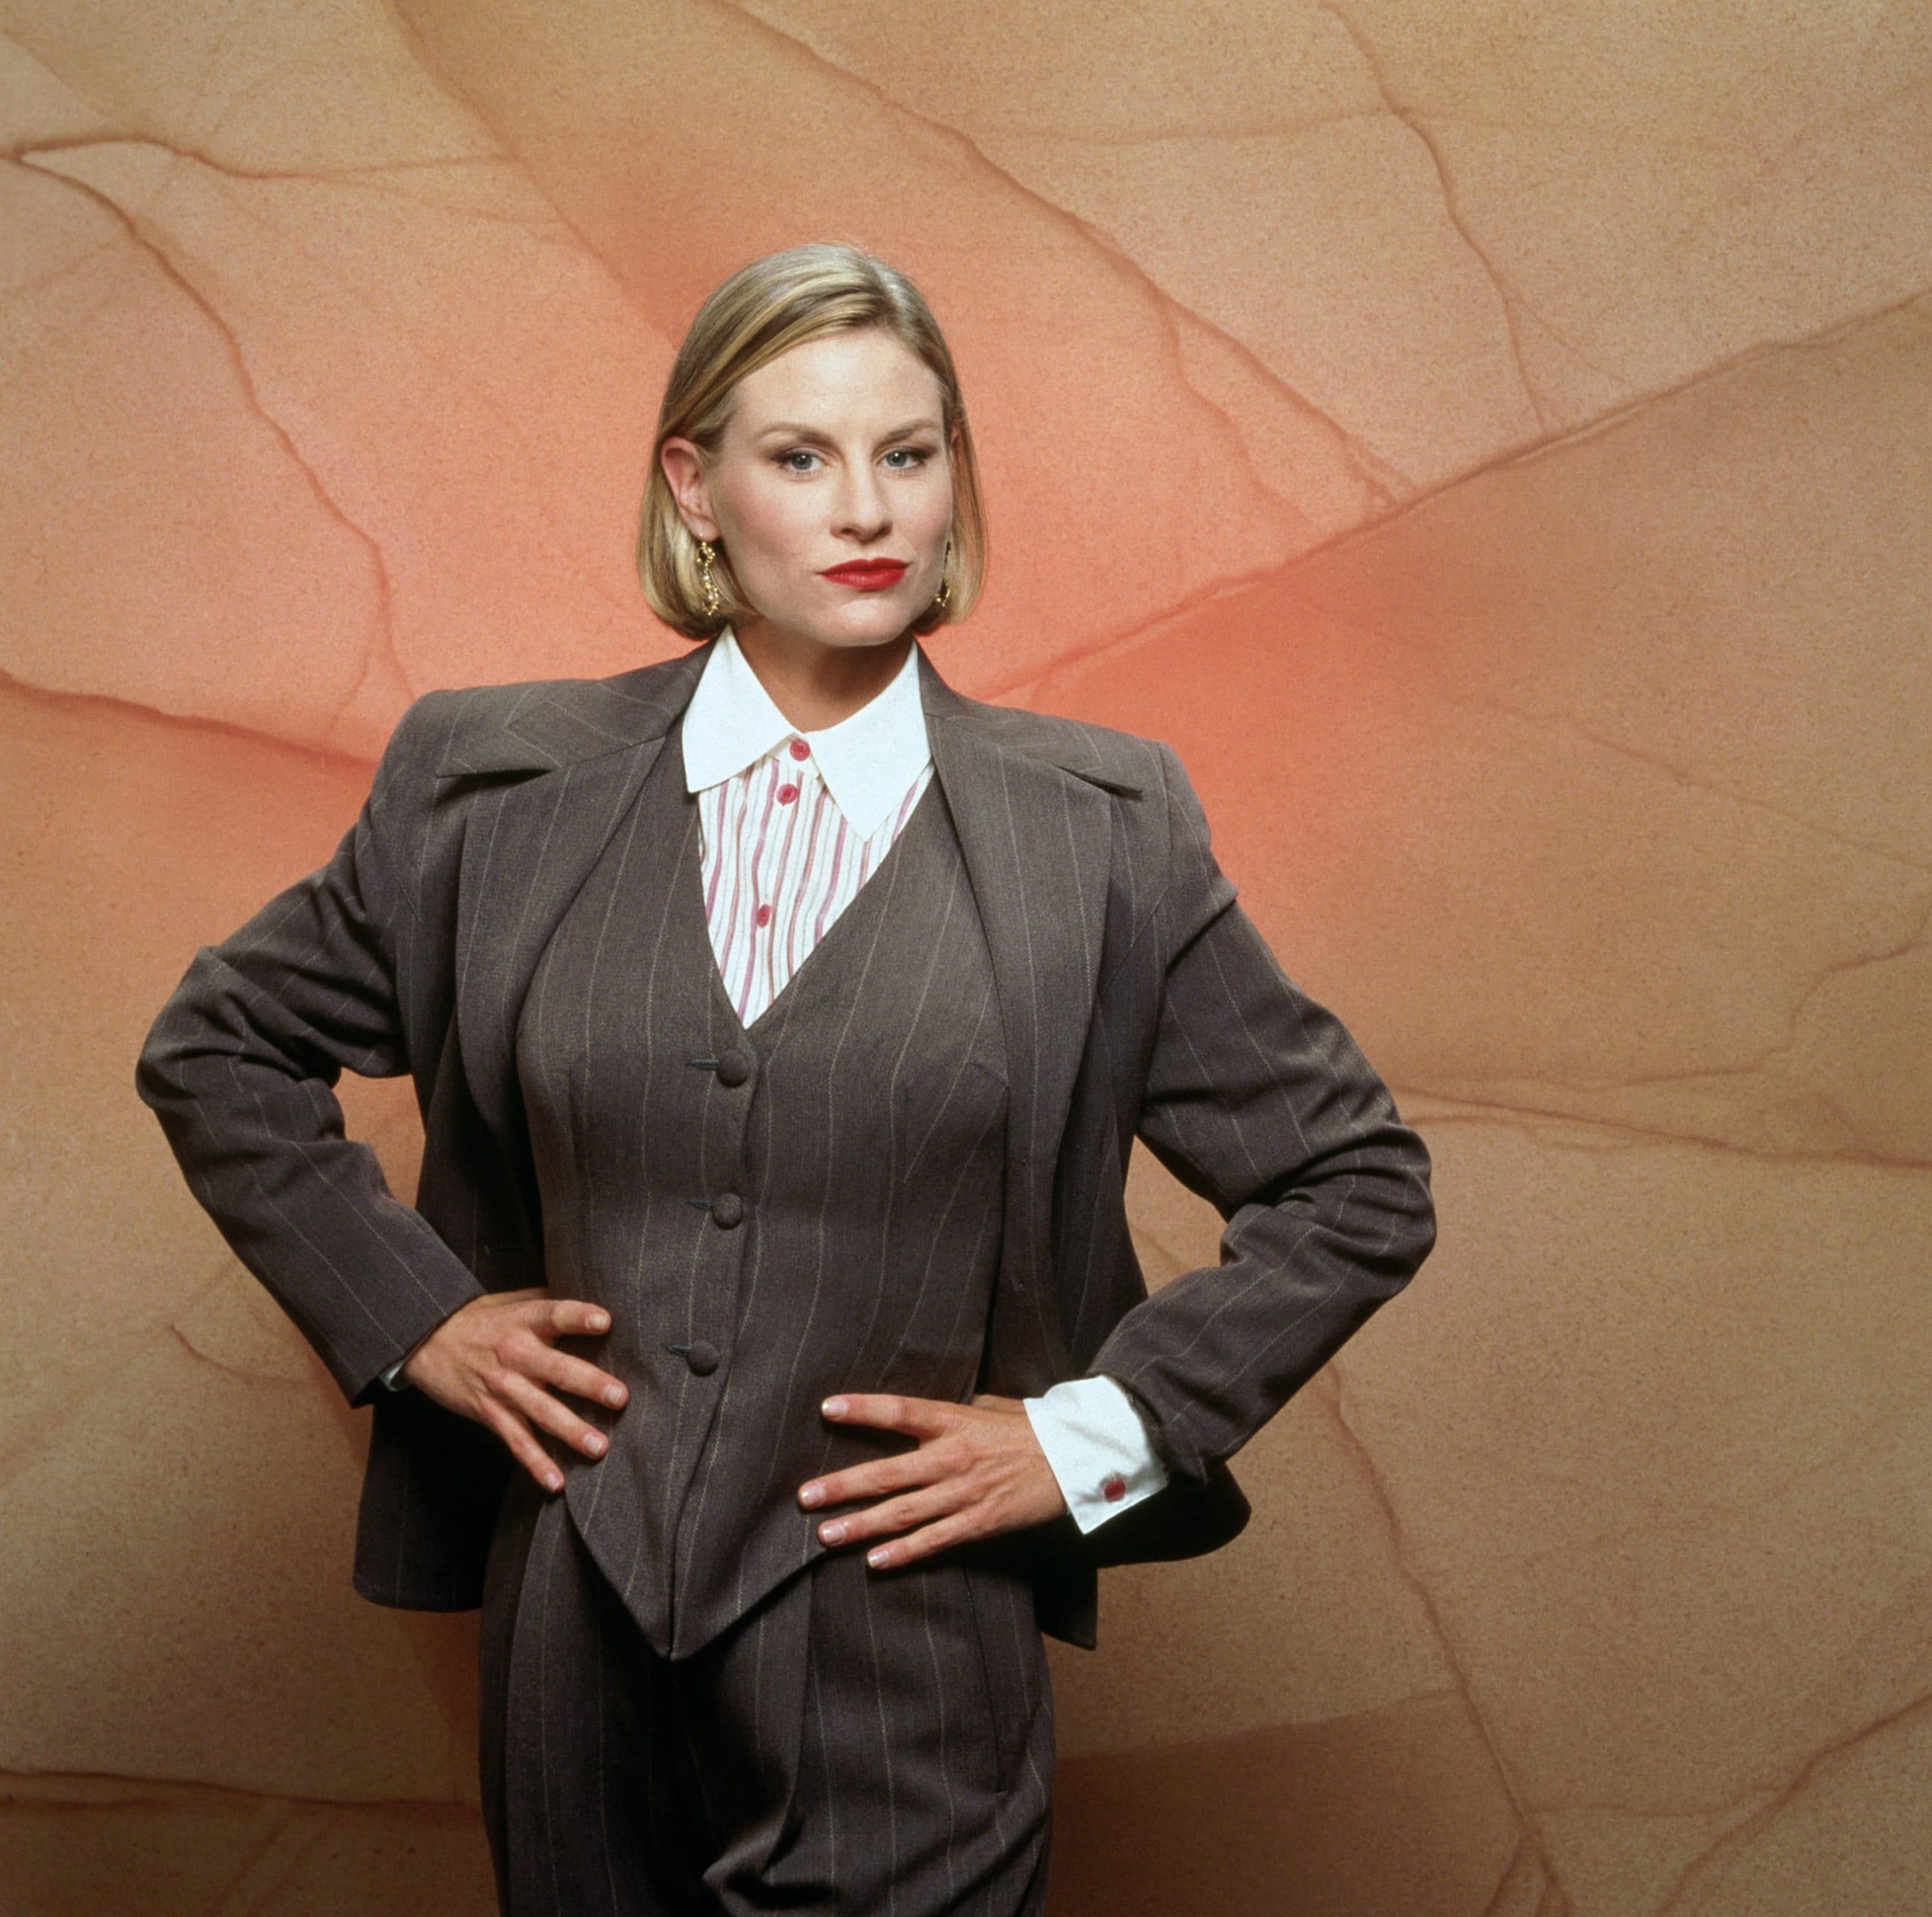 THE NANNY, Lauren Lane, 1993-99